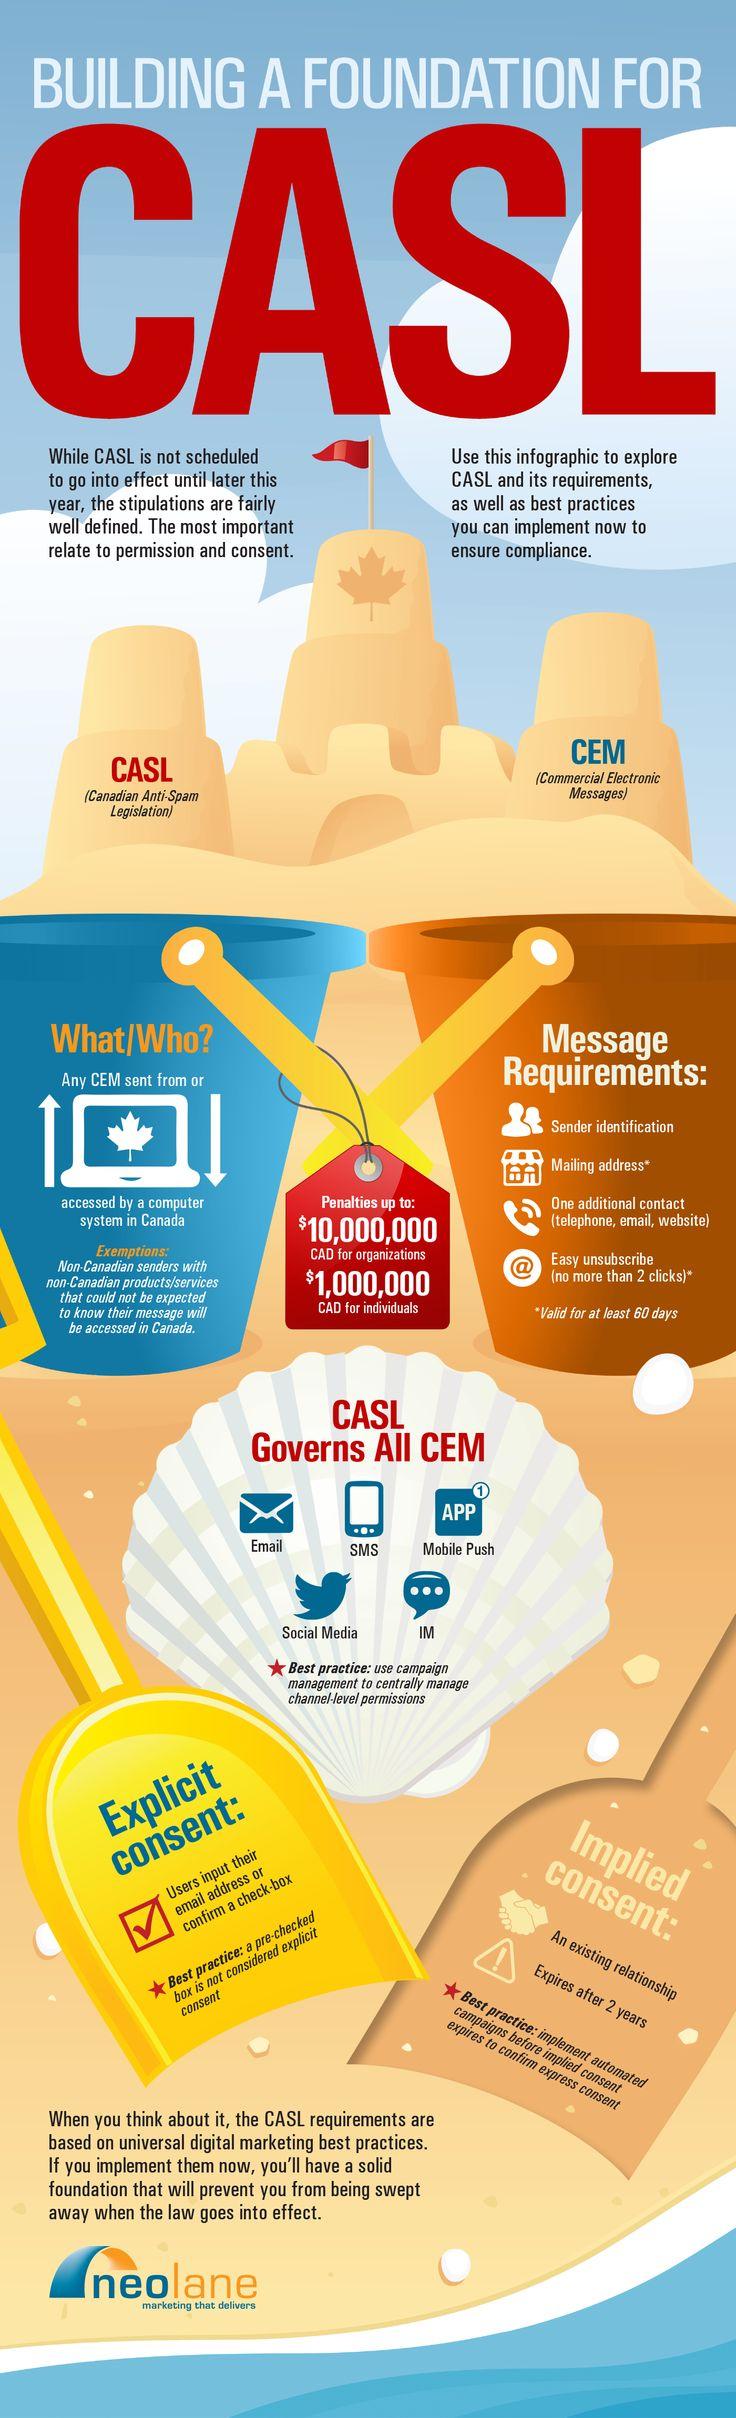 #Infographic: Building a Foundation for CASL #emailmarketing #digitalmarketing